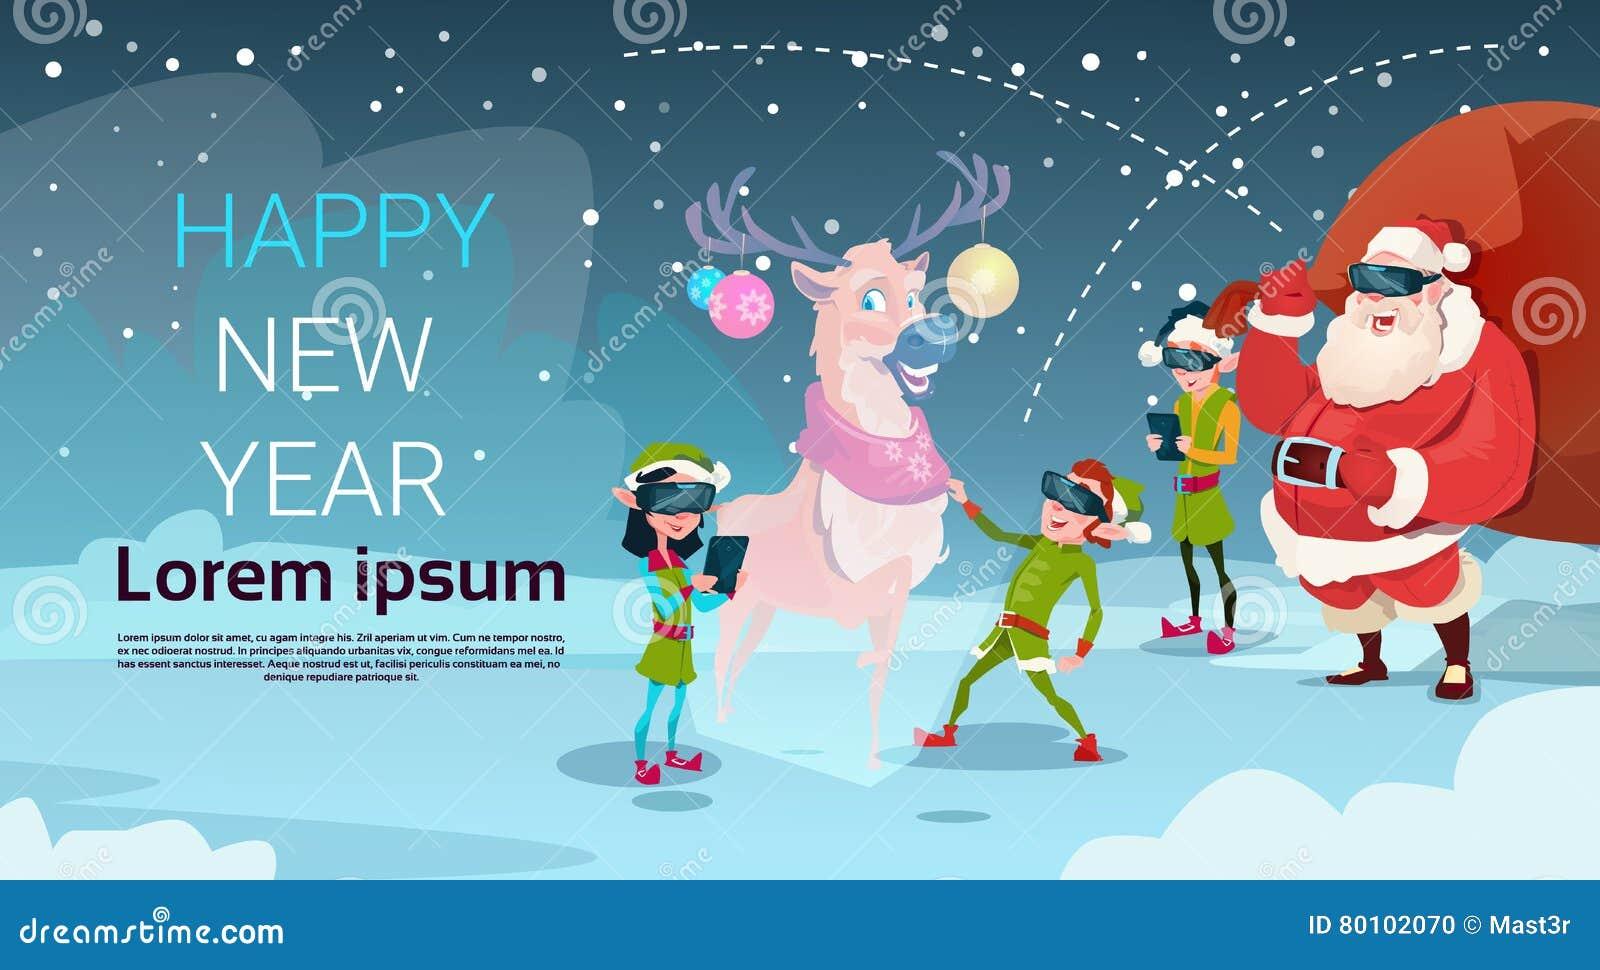 Os vidros de Santa Clause Elf Group Wear Digital veem o ano novo feliz do Feliz Natal da rena da realidade virtual